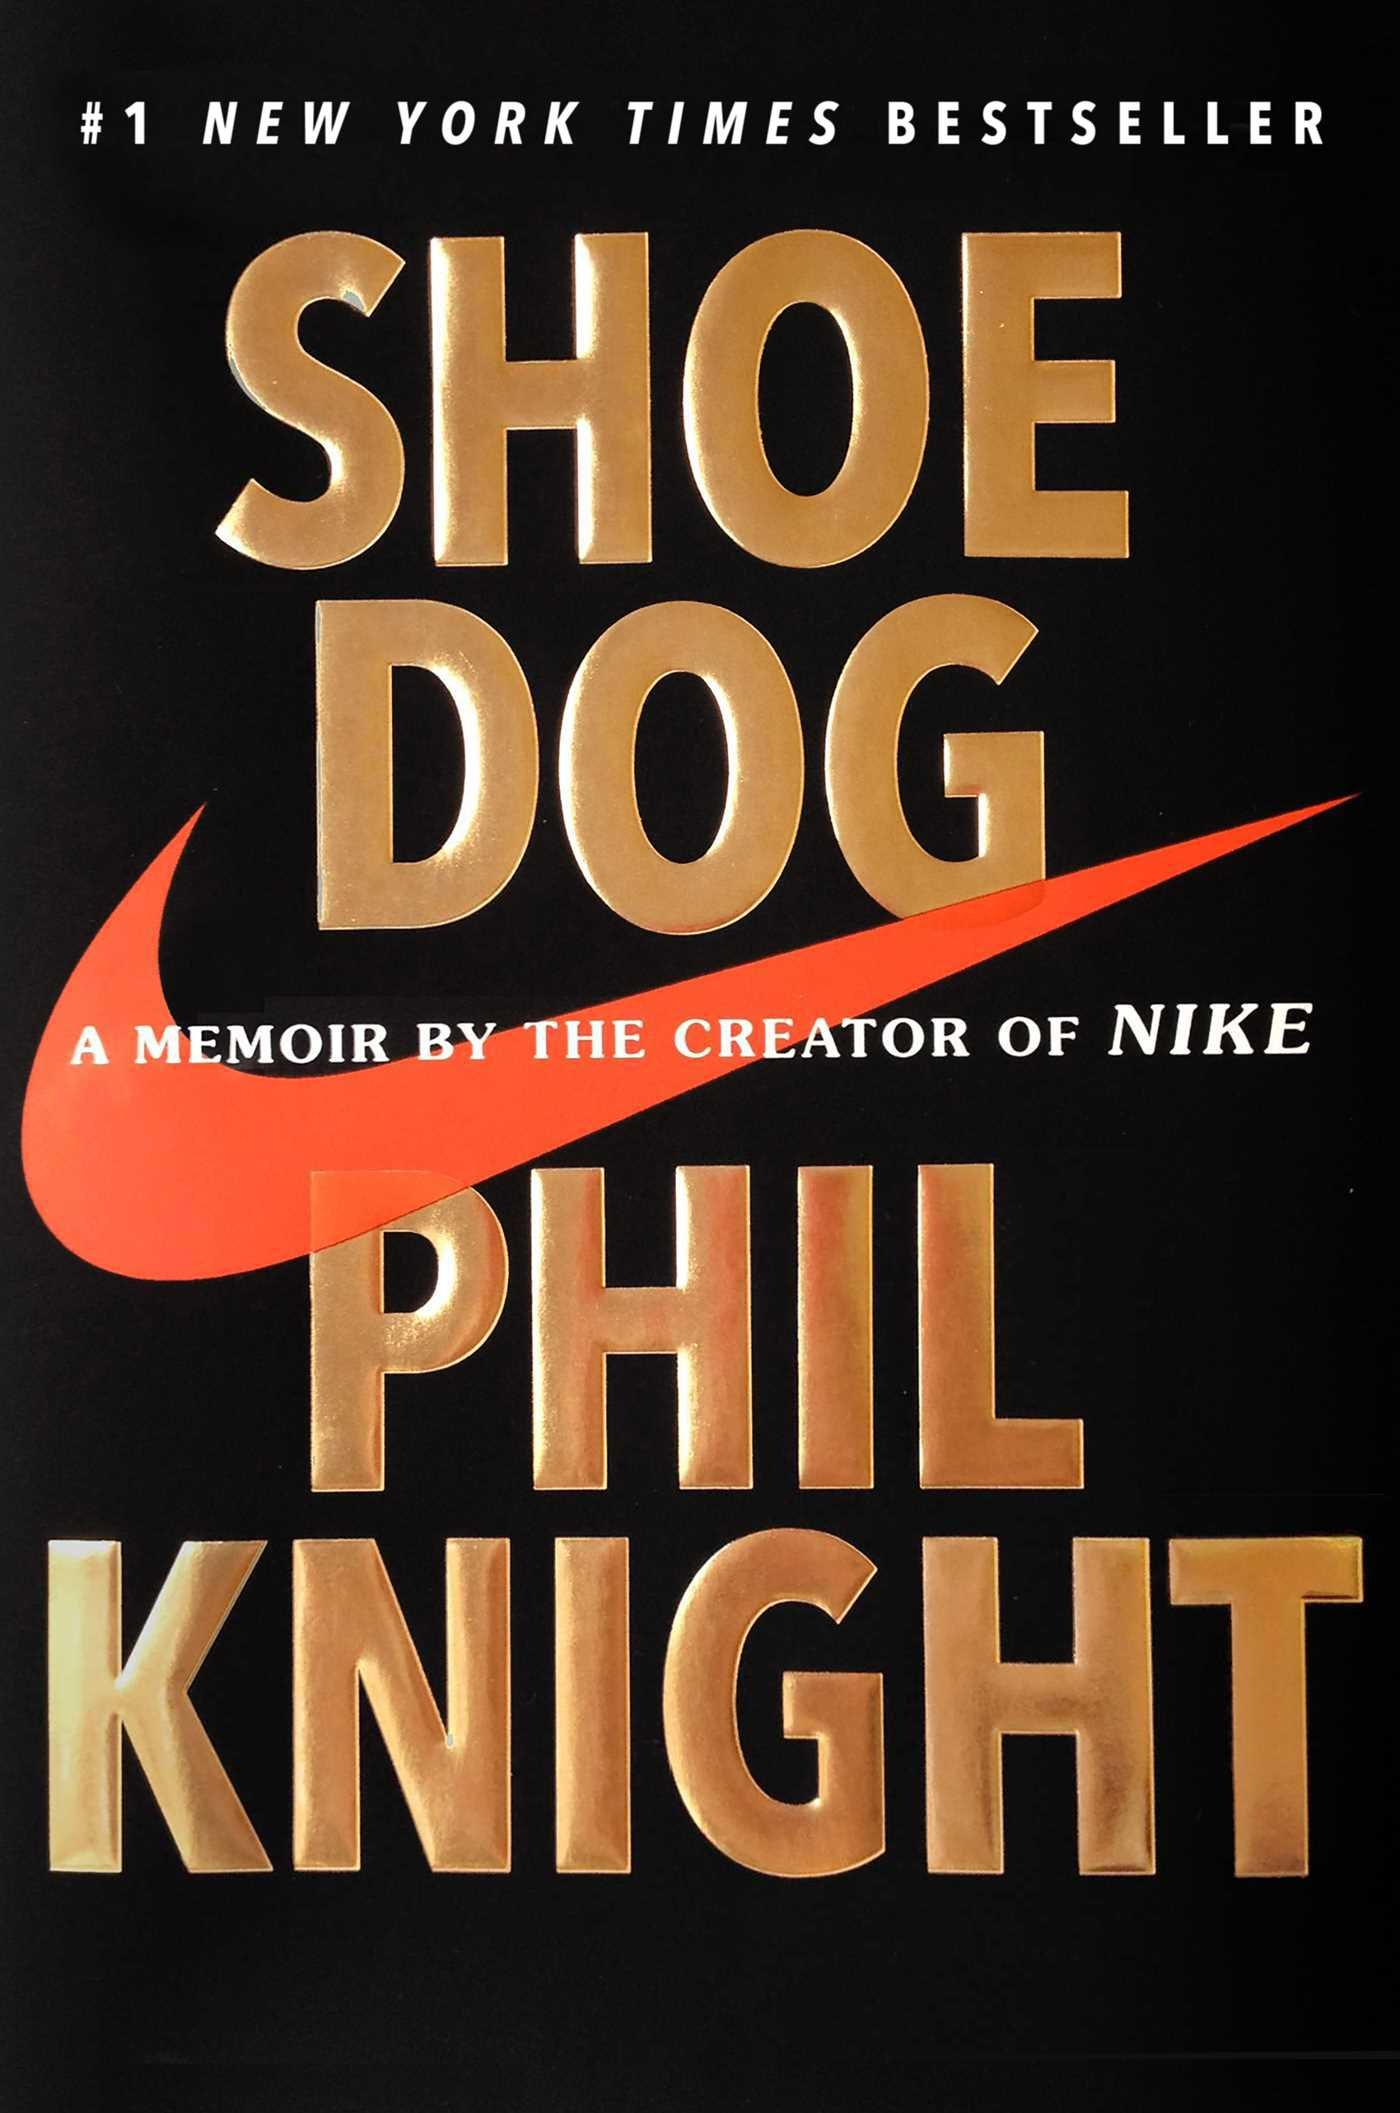 File:Shoe dog book cover.jpg - Wikipedia